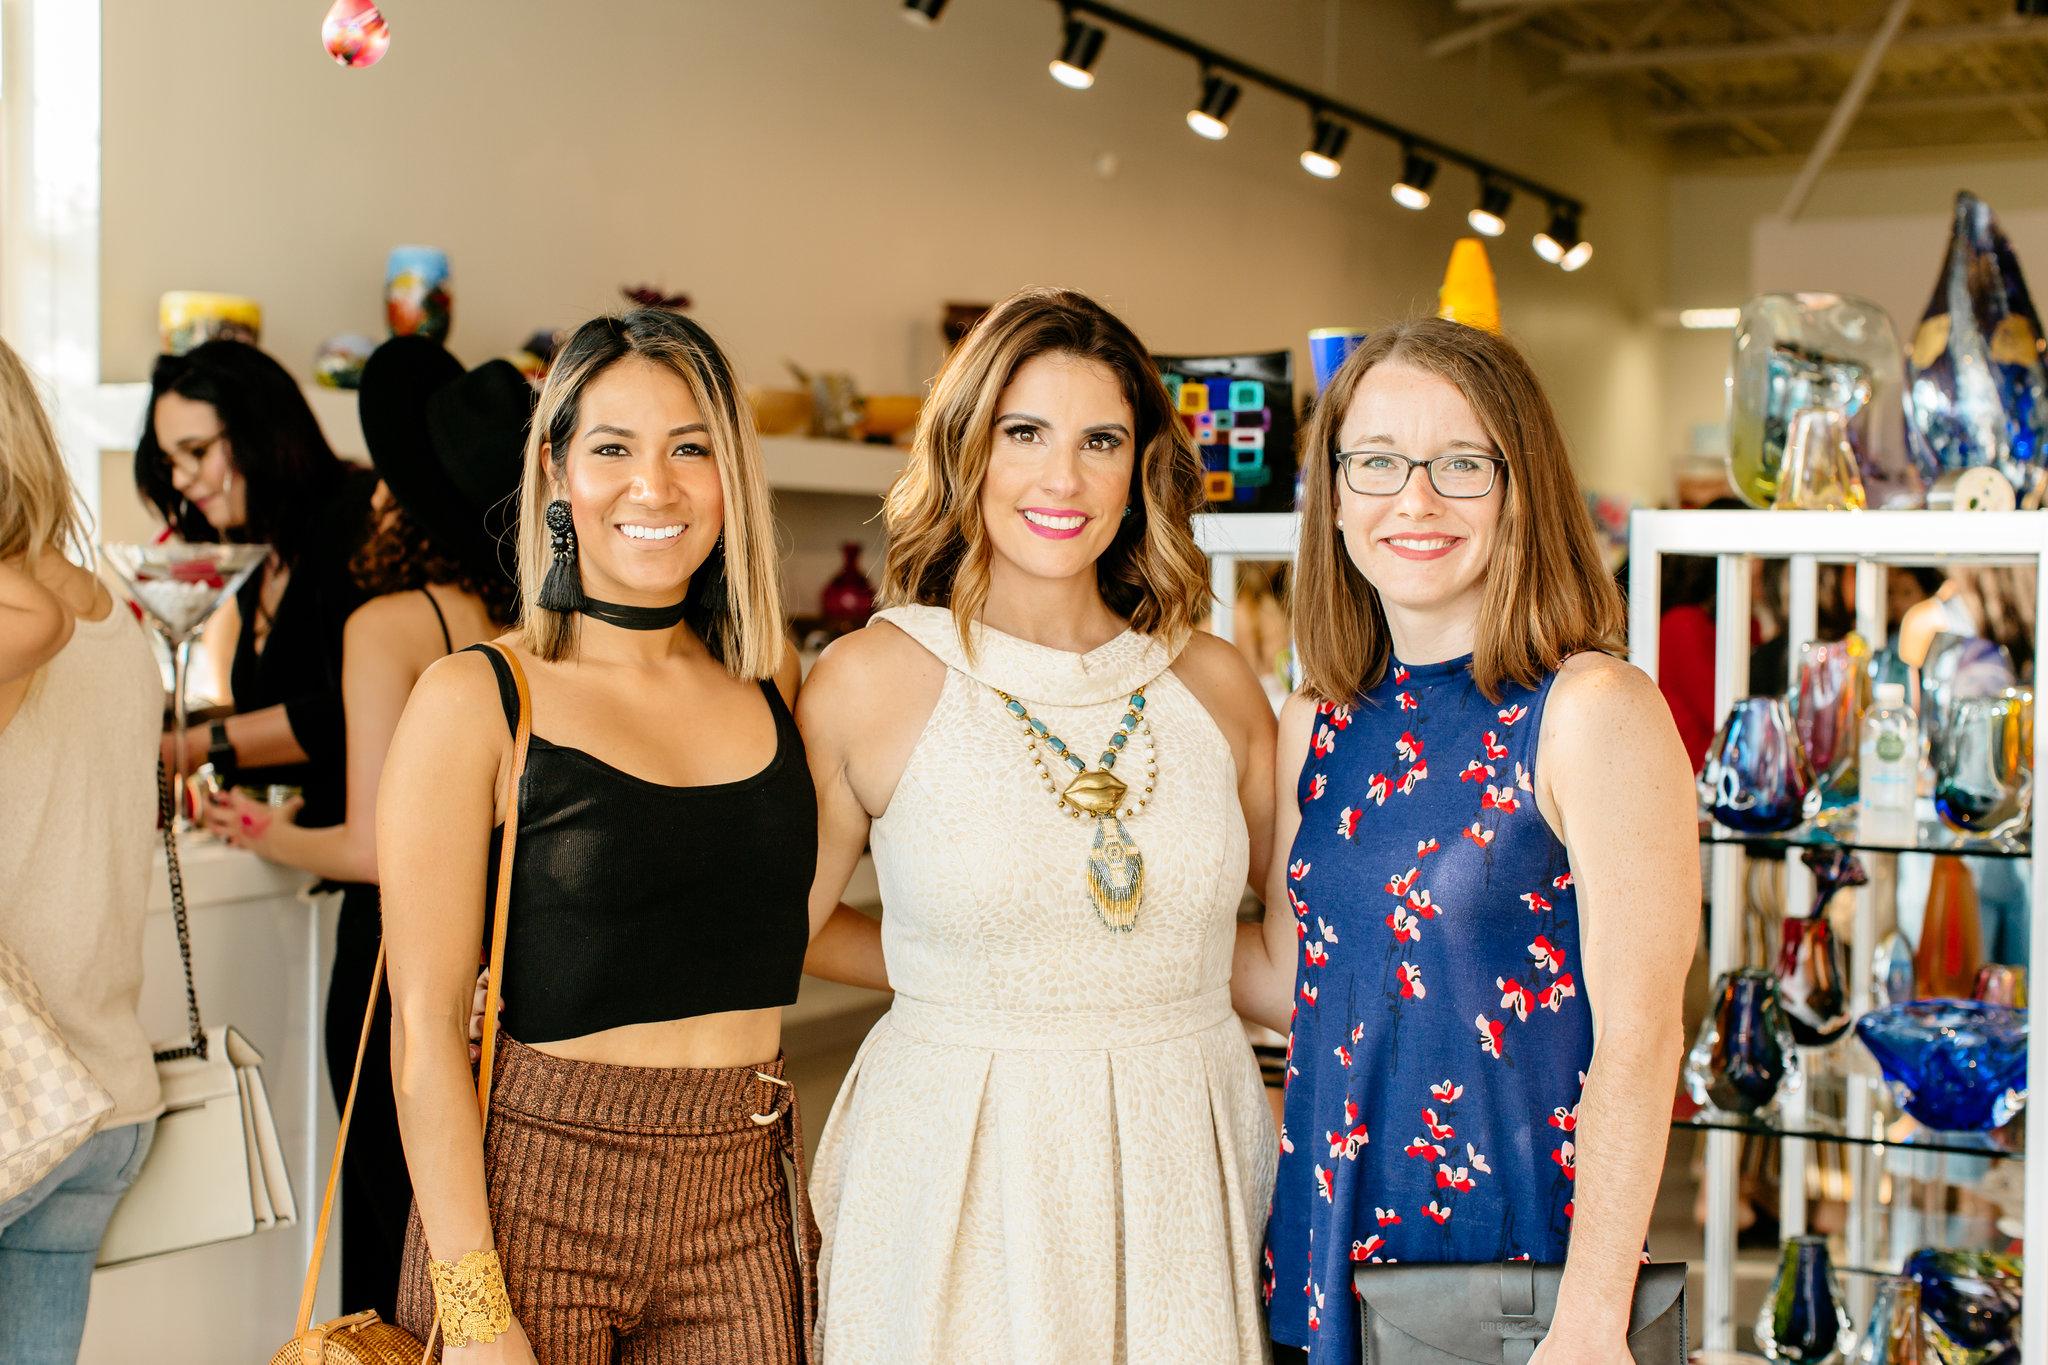 Alexa-Vossler-Photo_Dallas-Event-Photographer_Brite-Bar-Beauty-2018-Lipstick-Launch-Party-140.jpg